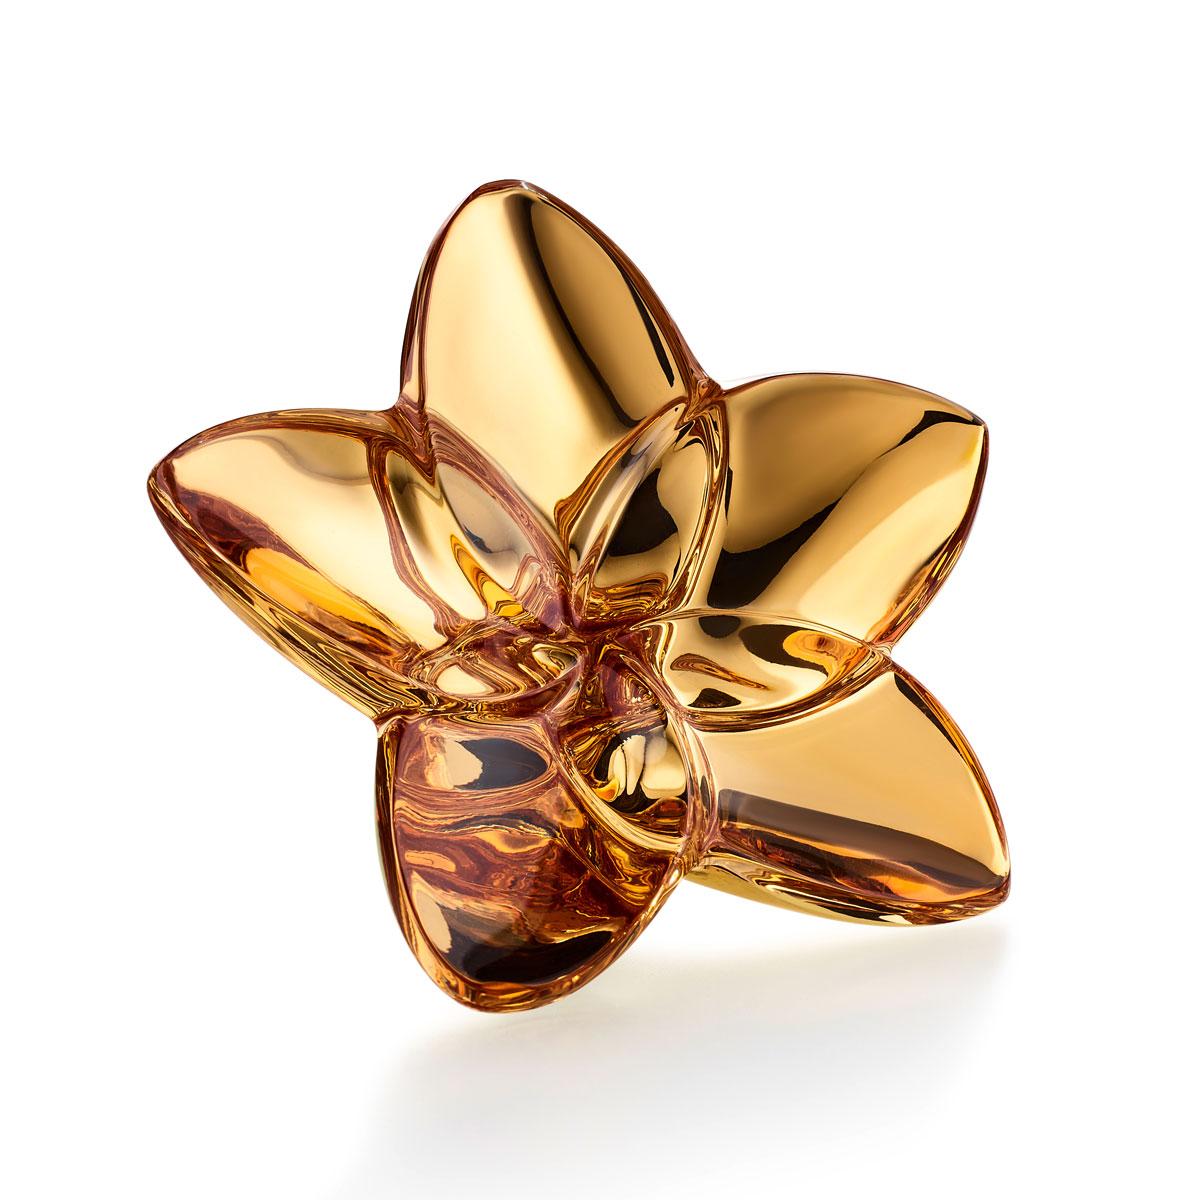 Baccarat Bloom Gold Flower Sculpture